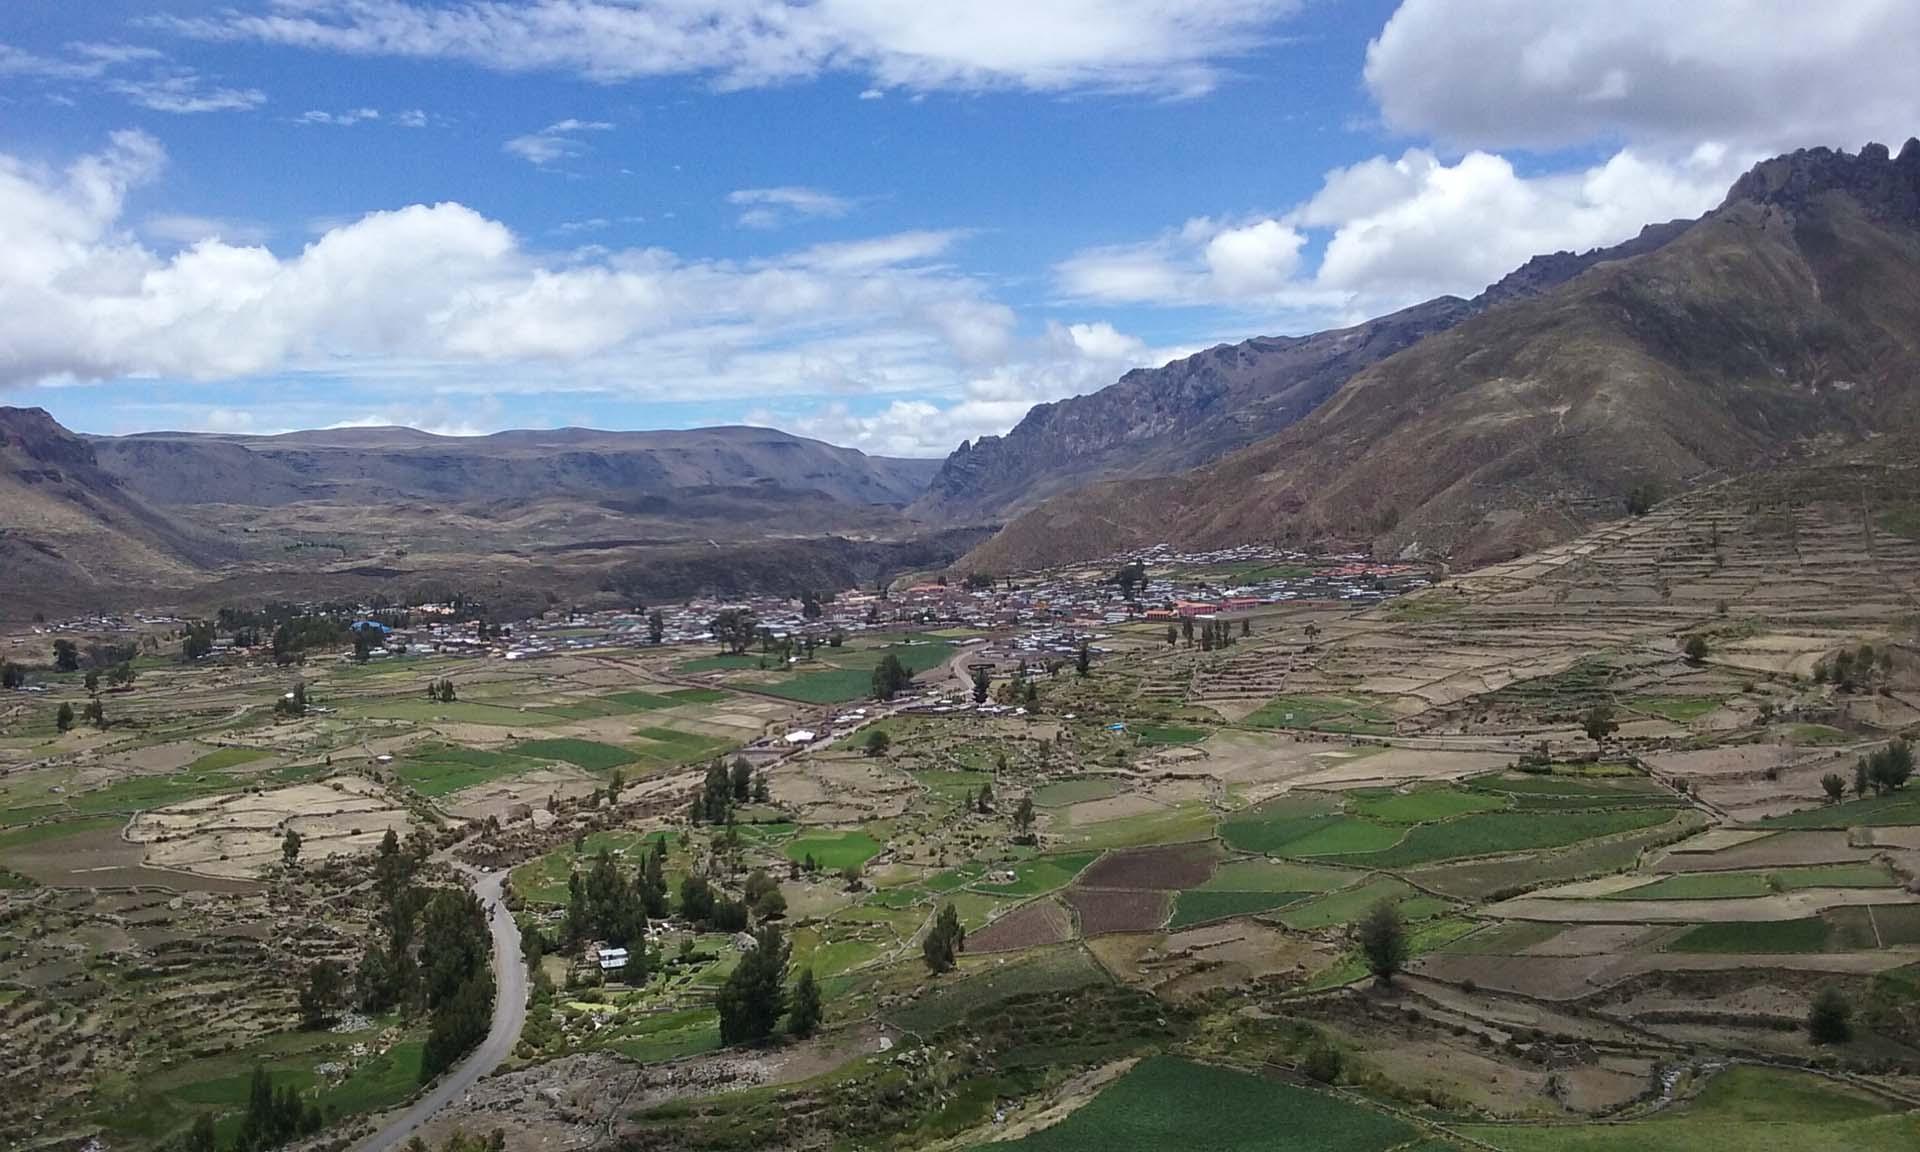 La vallée du Colca